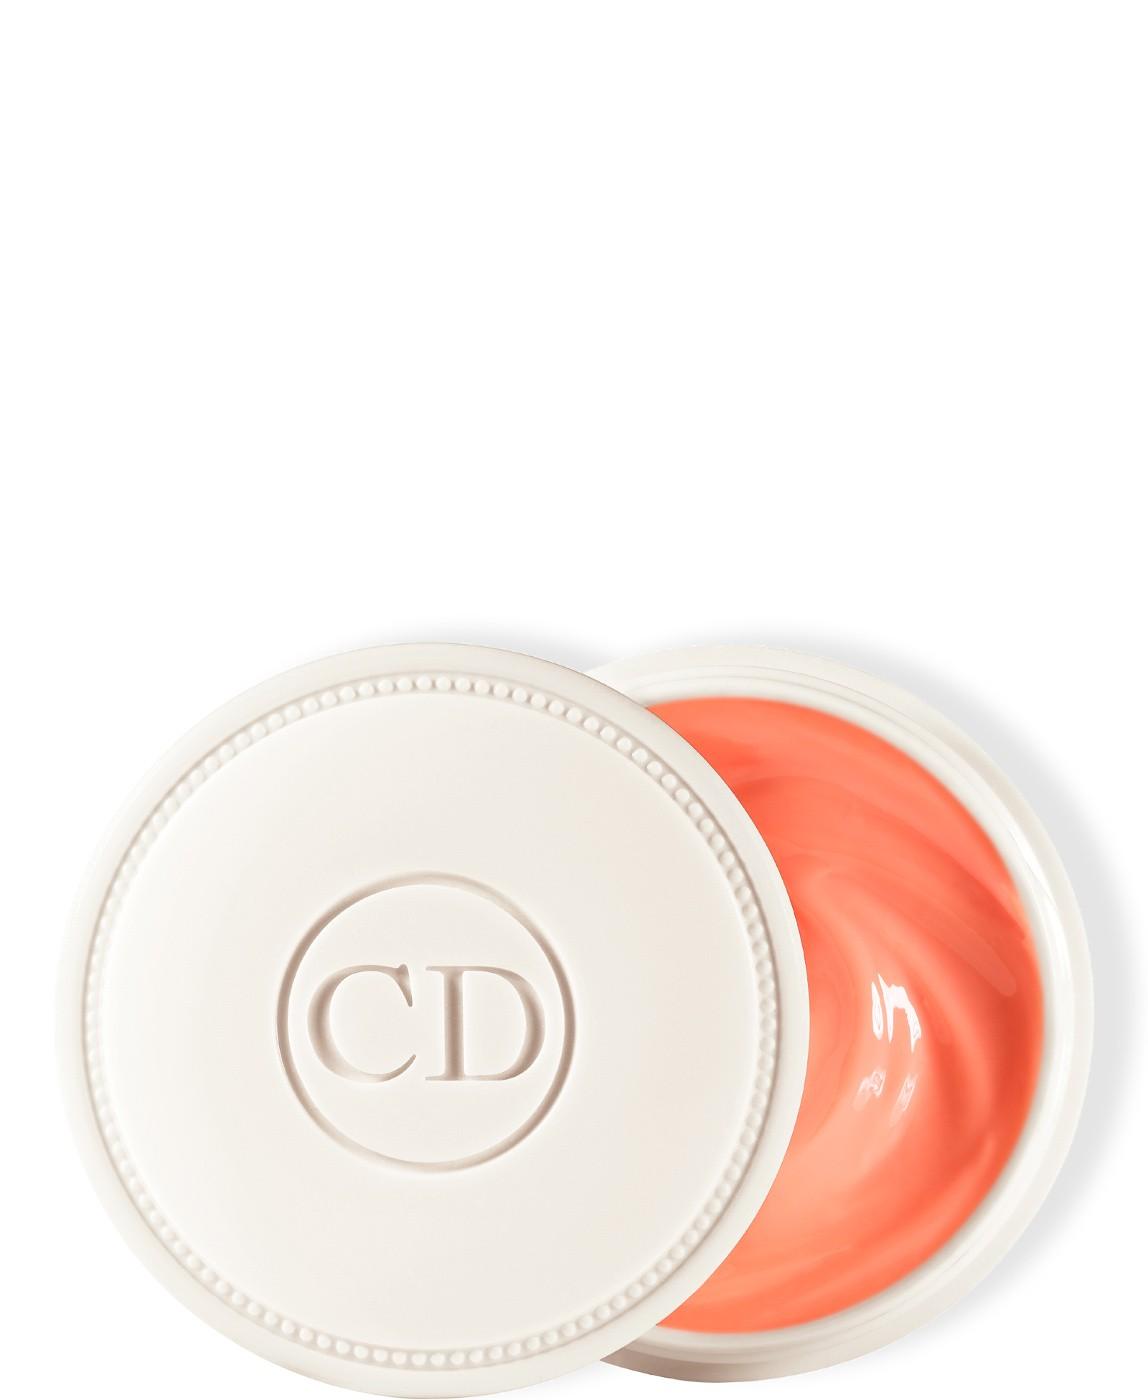 Dior - Abricot Nail Creme - Women